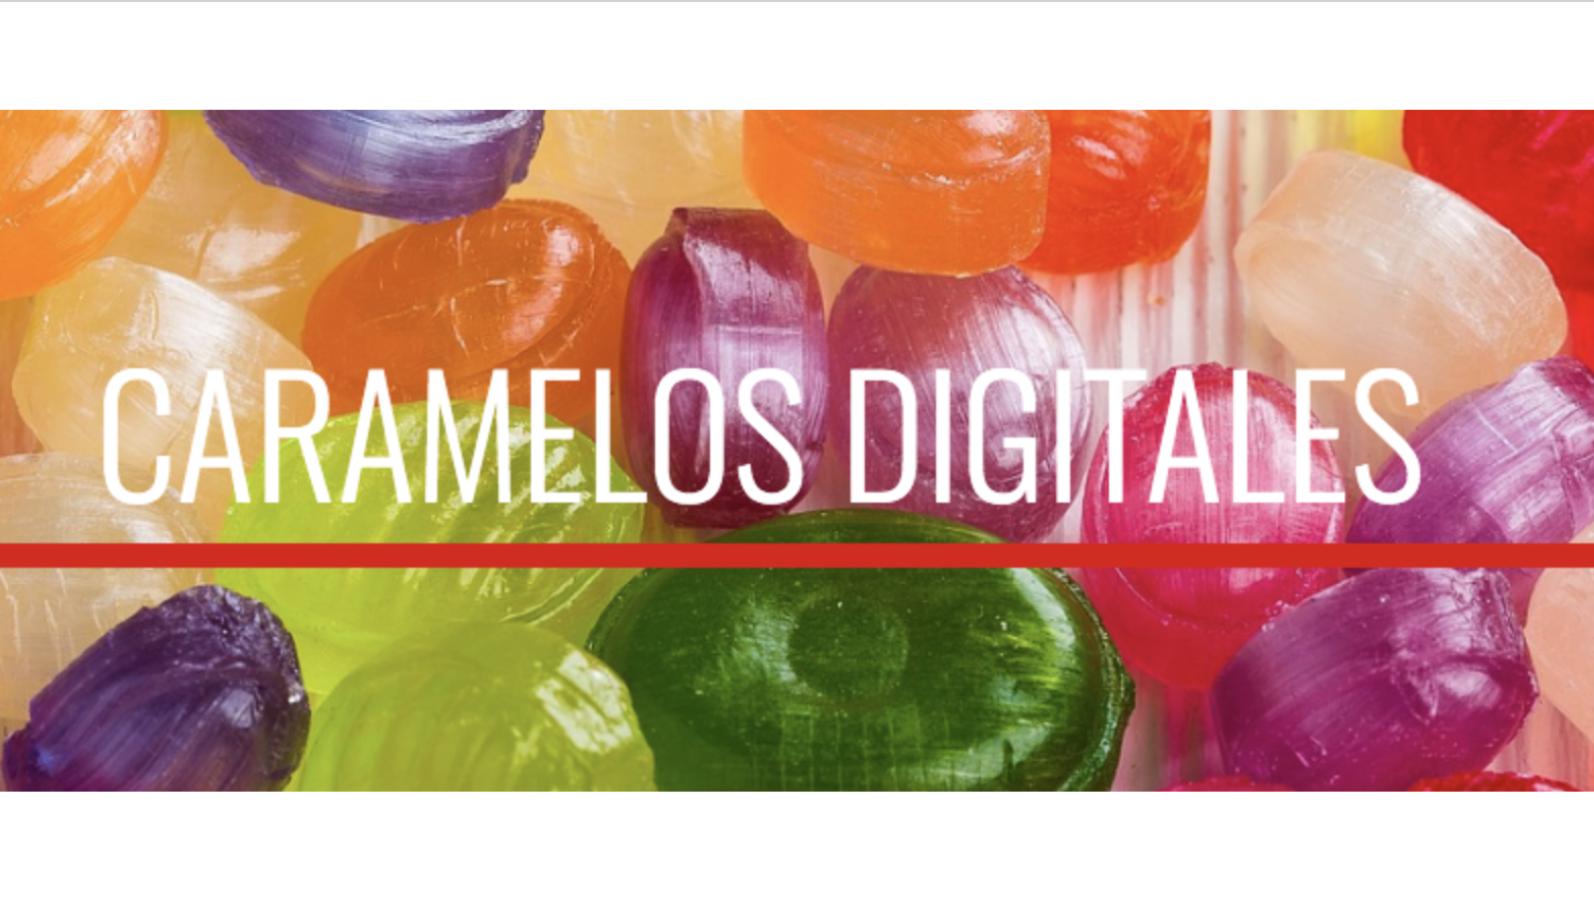 Caramelos Digitales